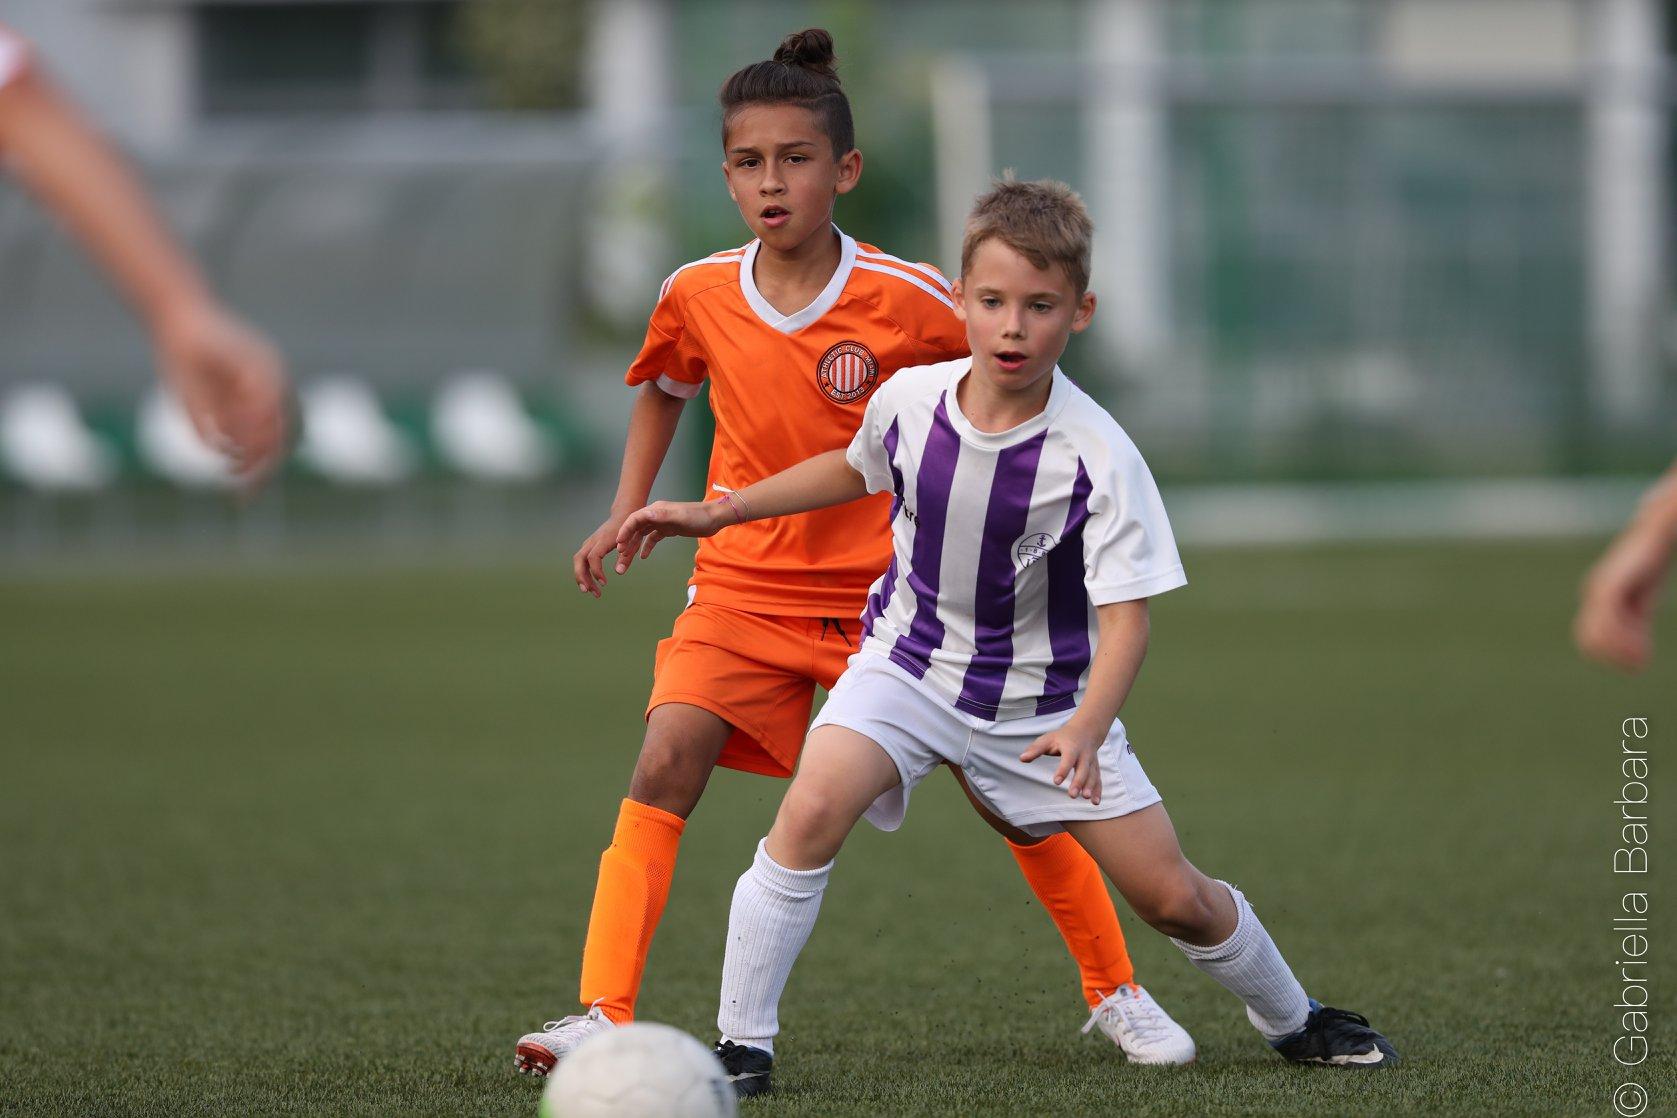 Lushan Agrawal Intersport Hungary 2018 Summer.jpg